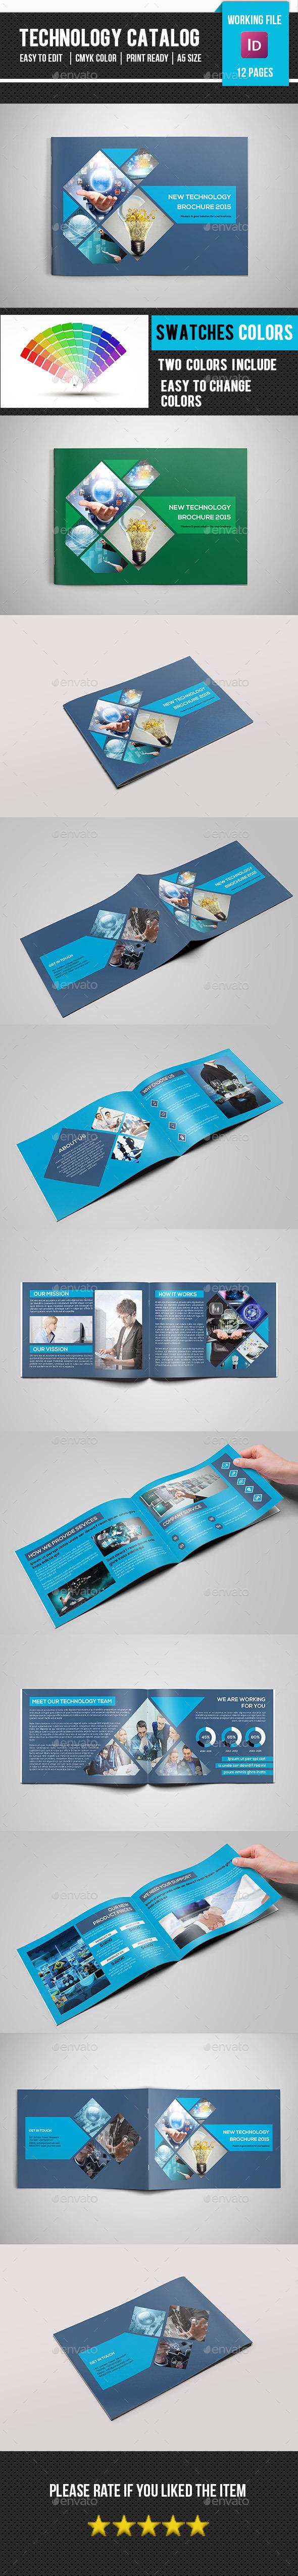 Technology Brochure/Catalog-V180 - Catalogs Brochures